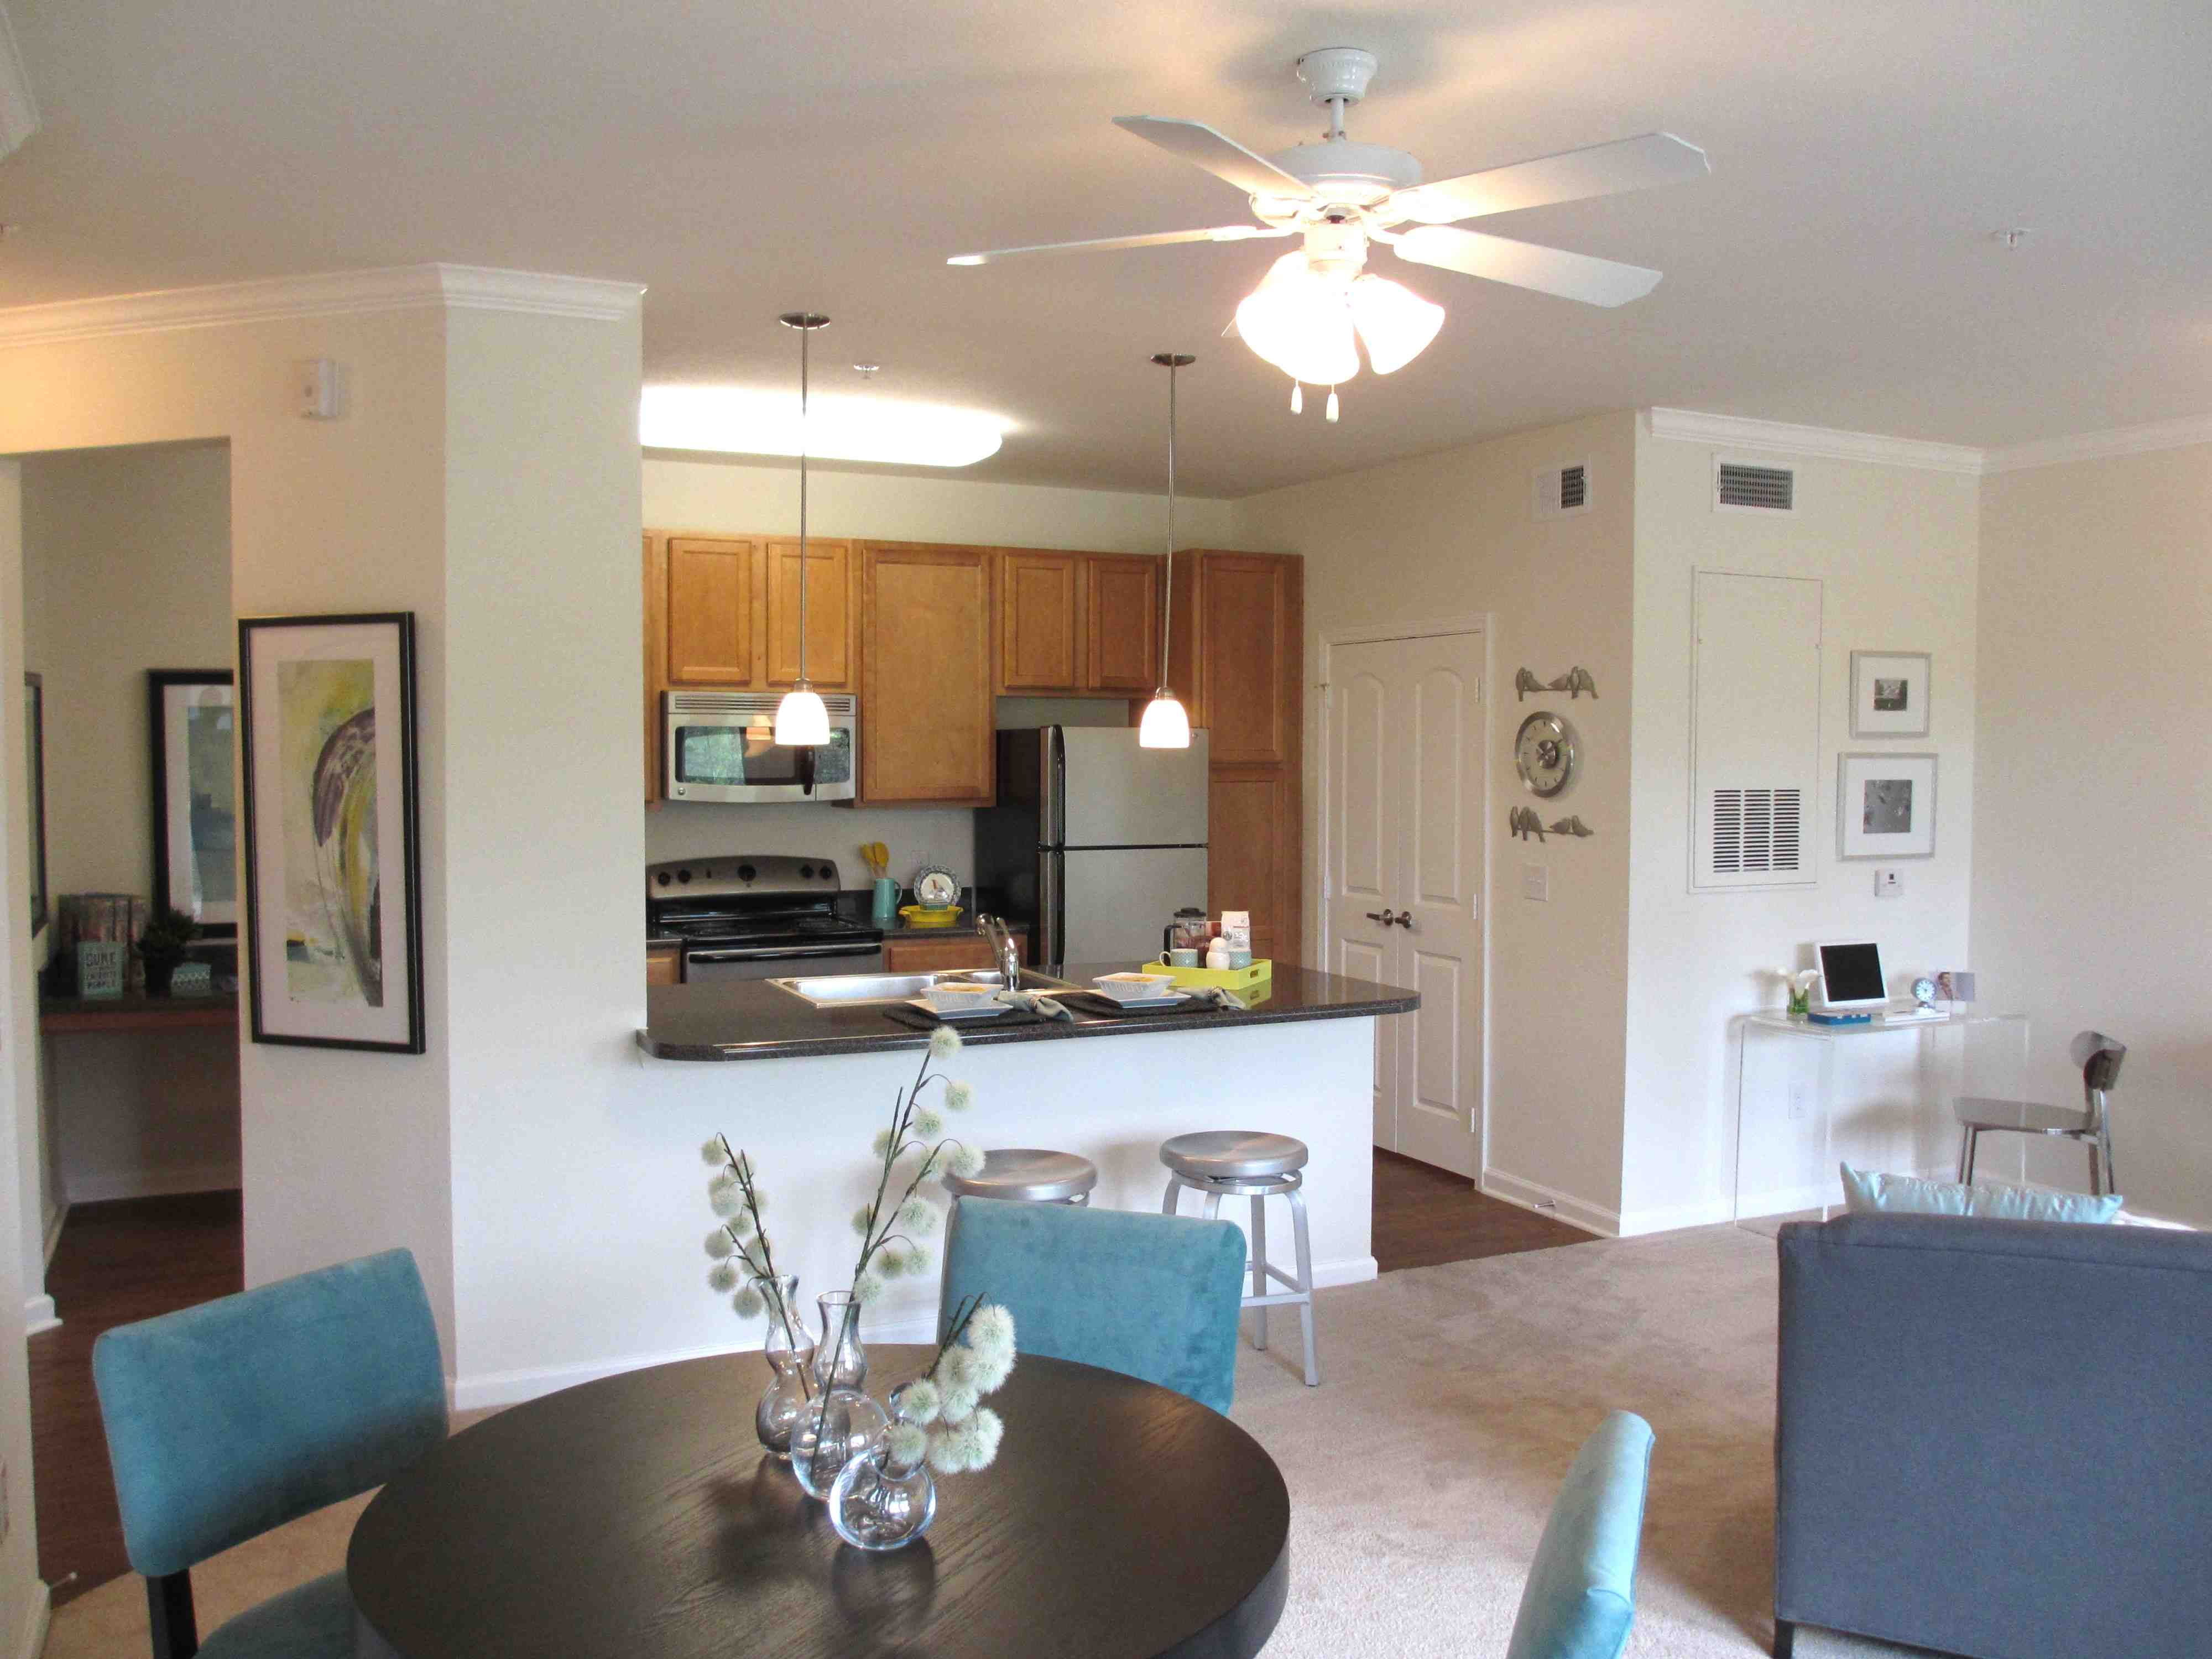 Bridgeway Apartments 1000 Bridgeway Dr, Maryville, TN 37801 - YP.com